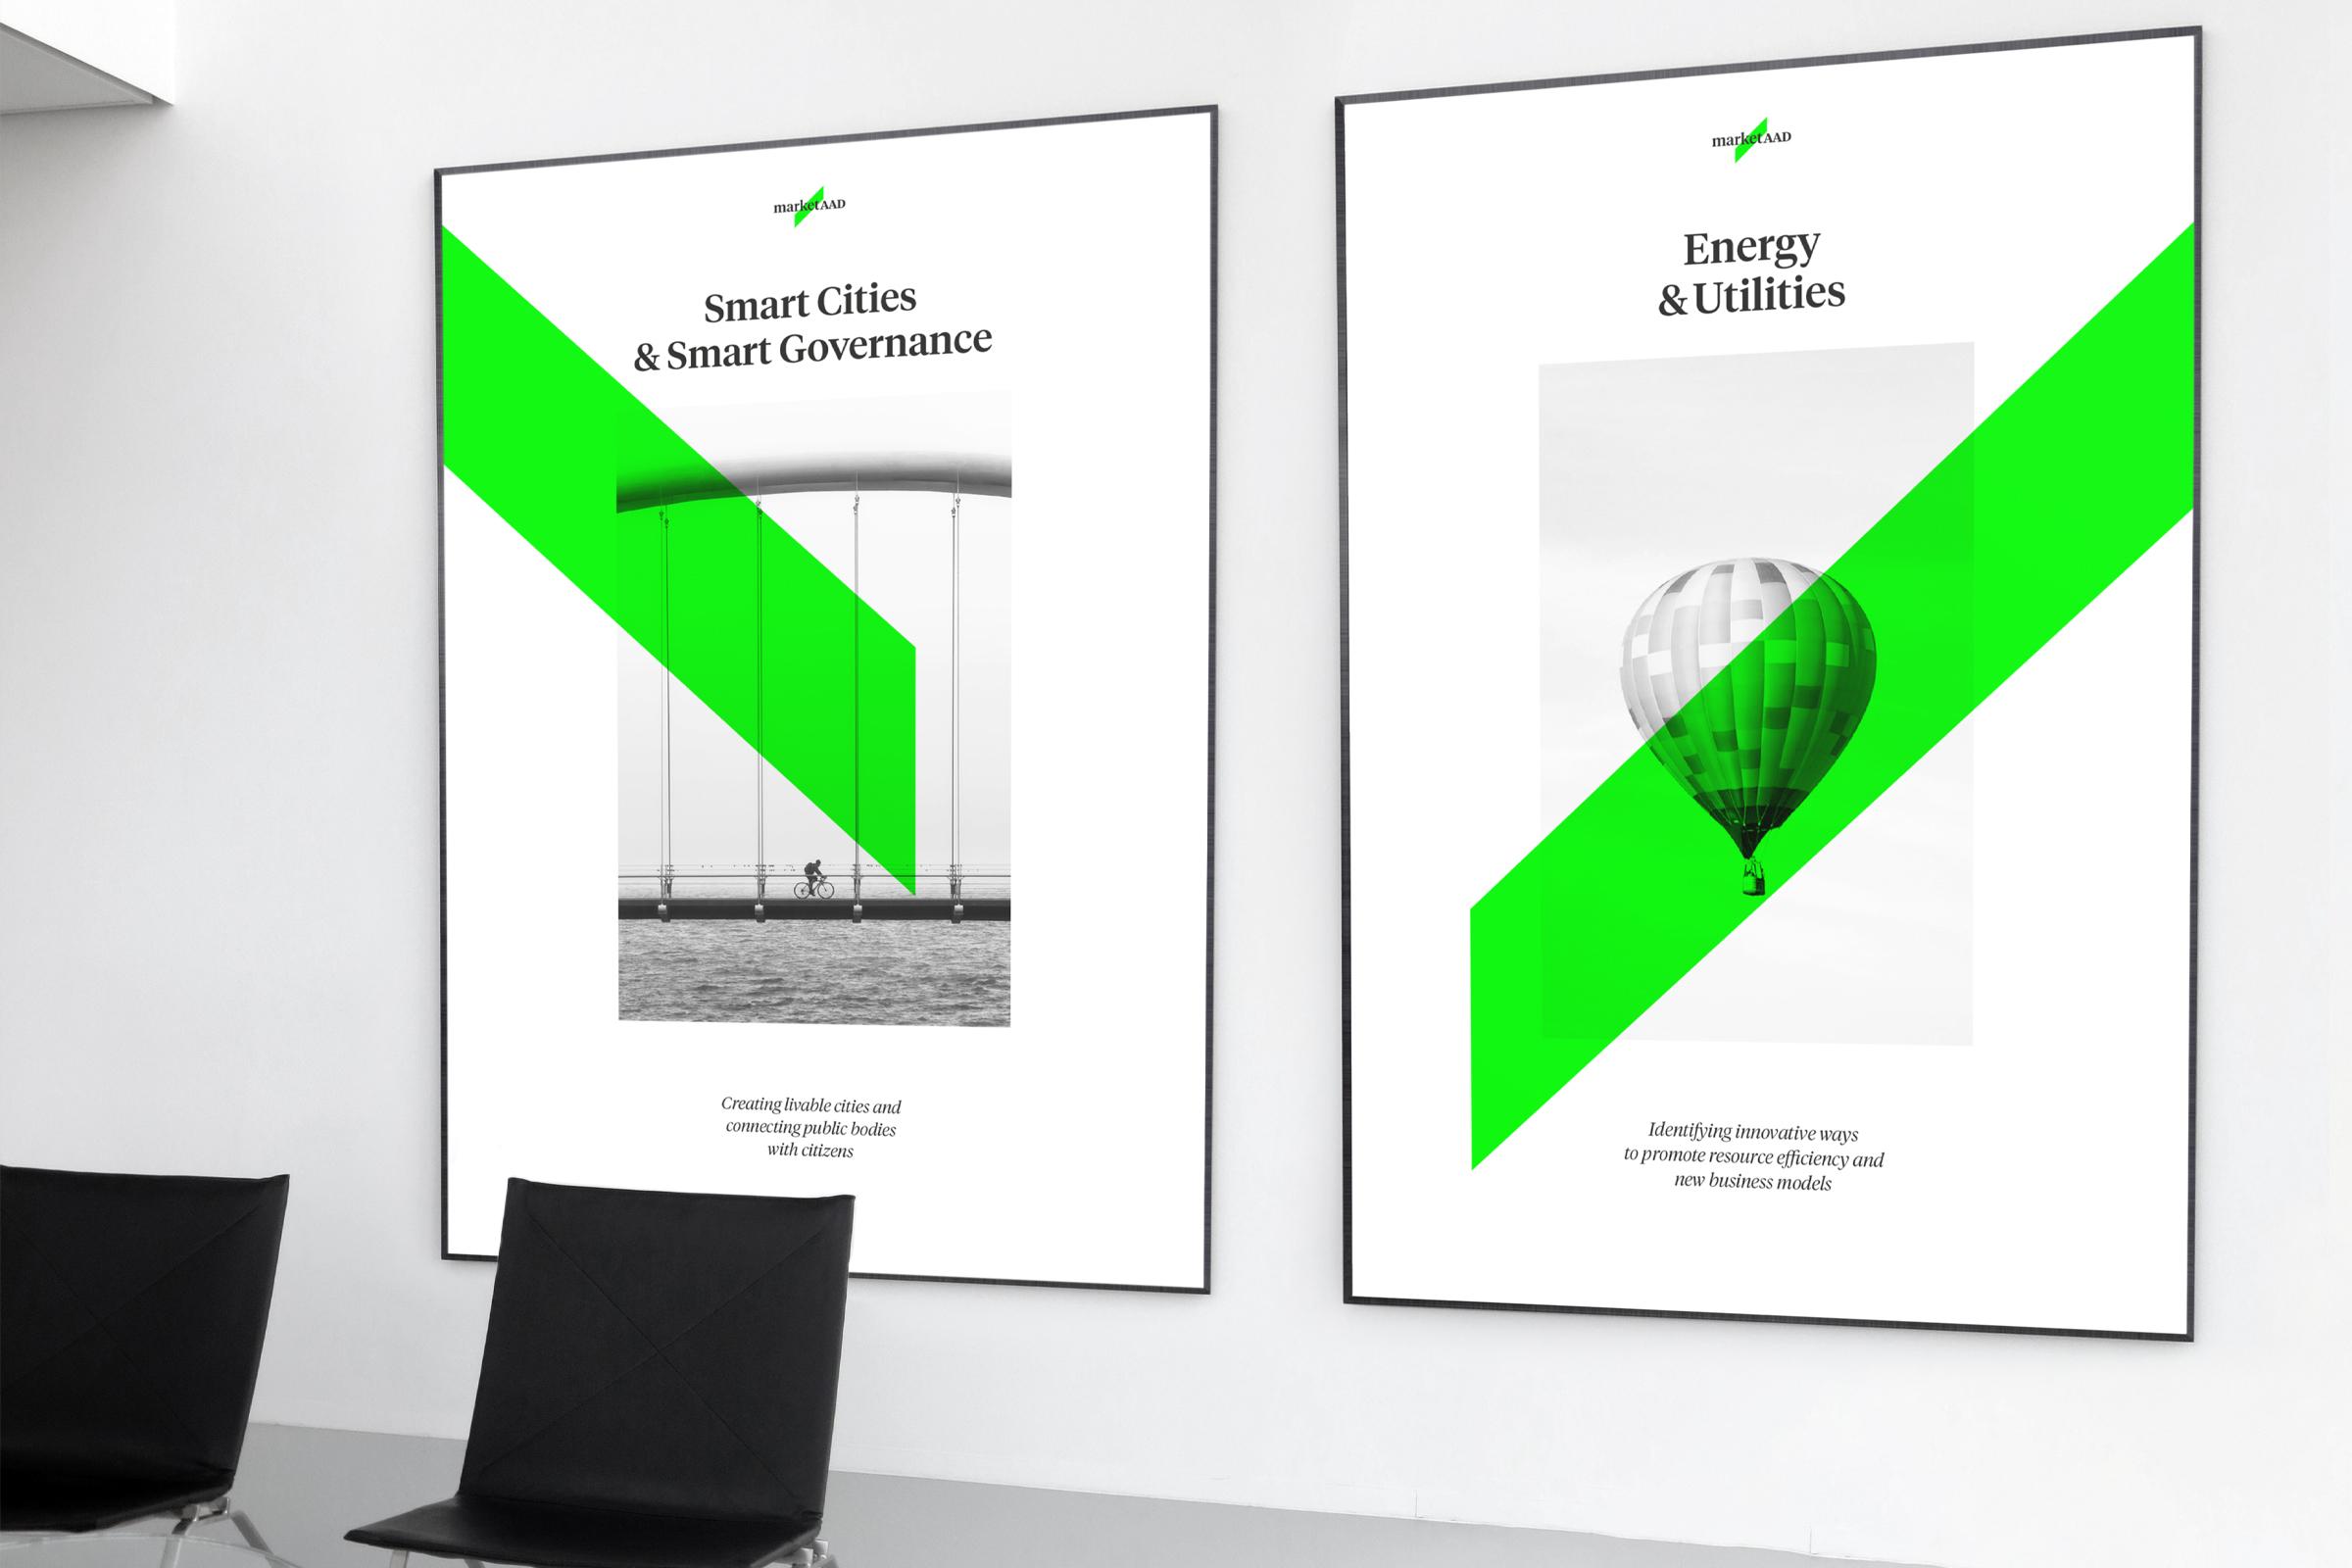 marketaad-Posters-2400x1600px